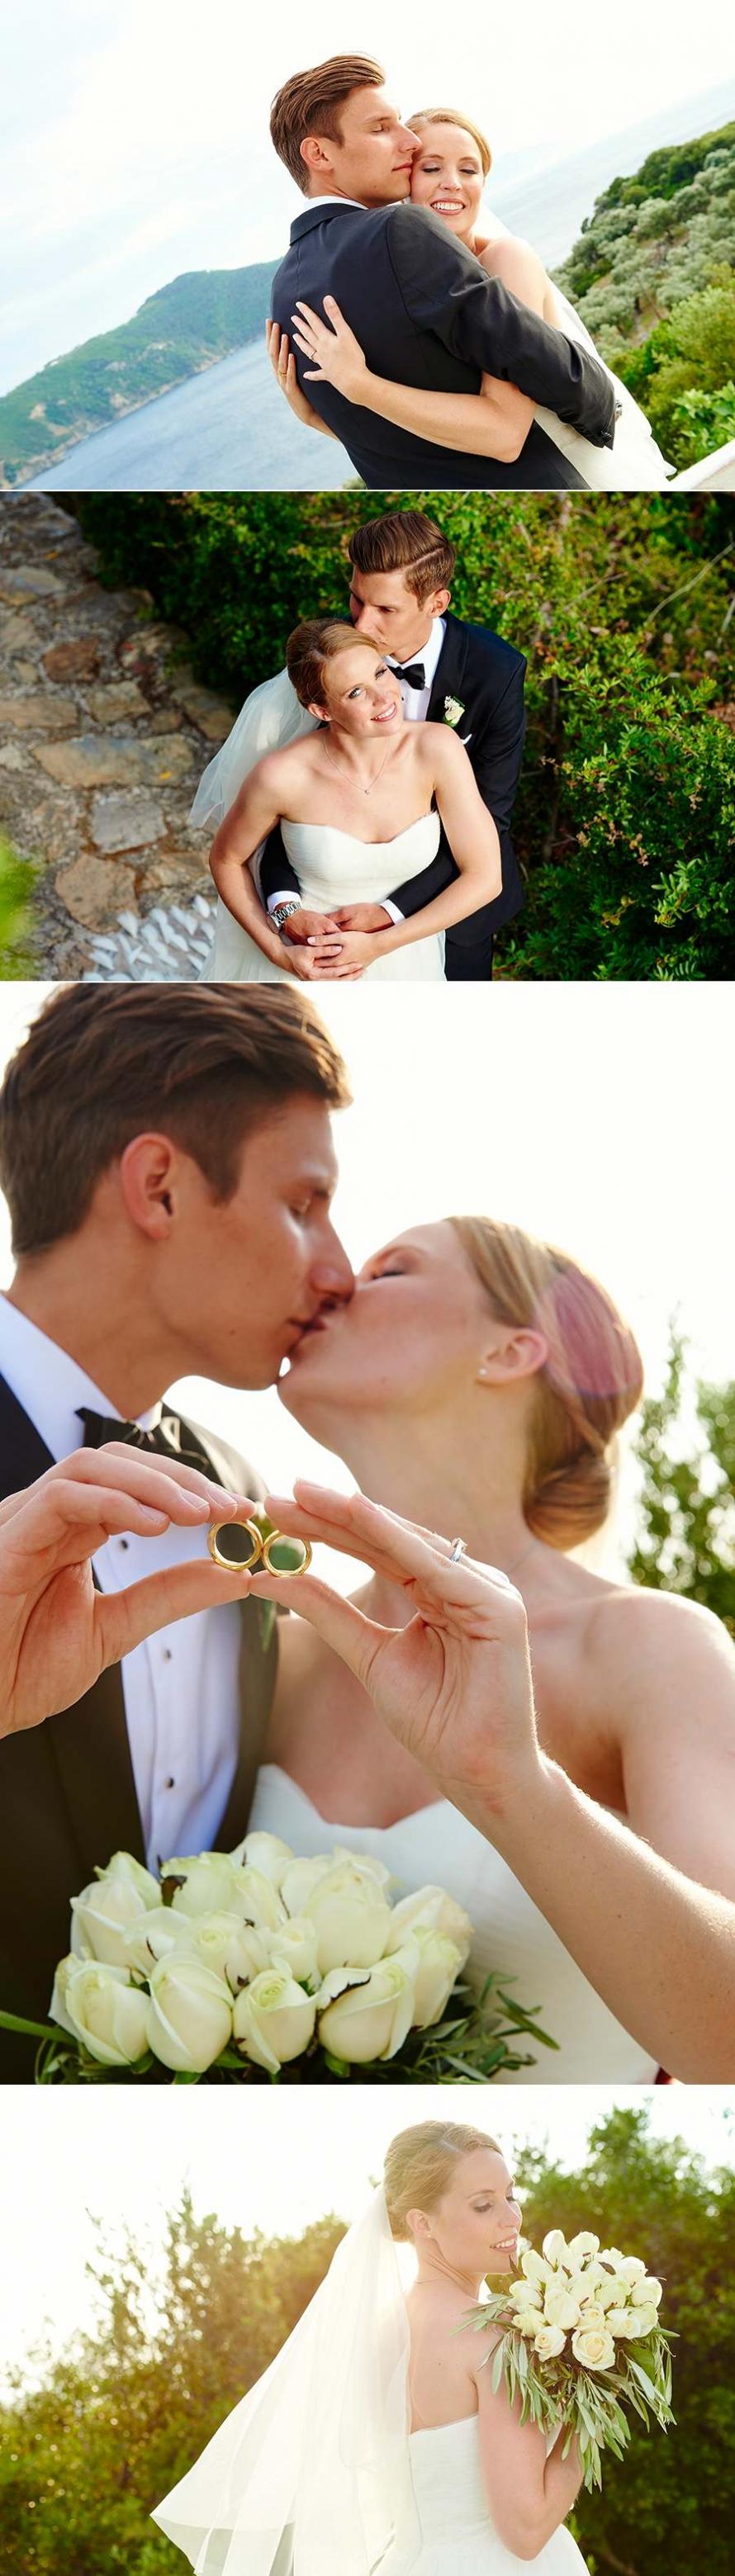 Tobi & Vanessa wedding photos 18